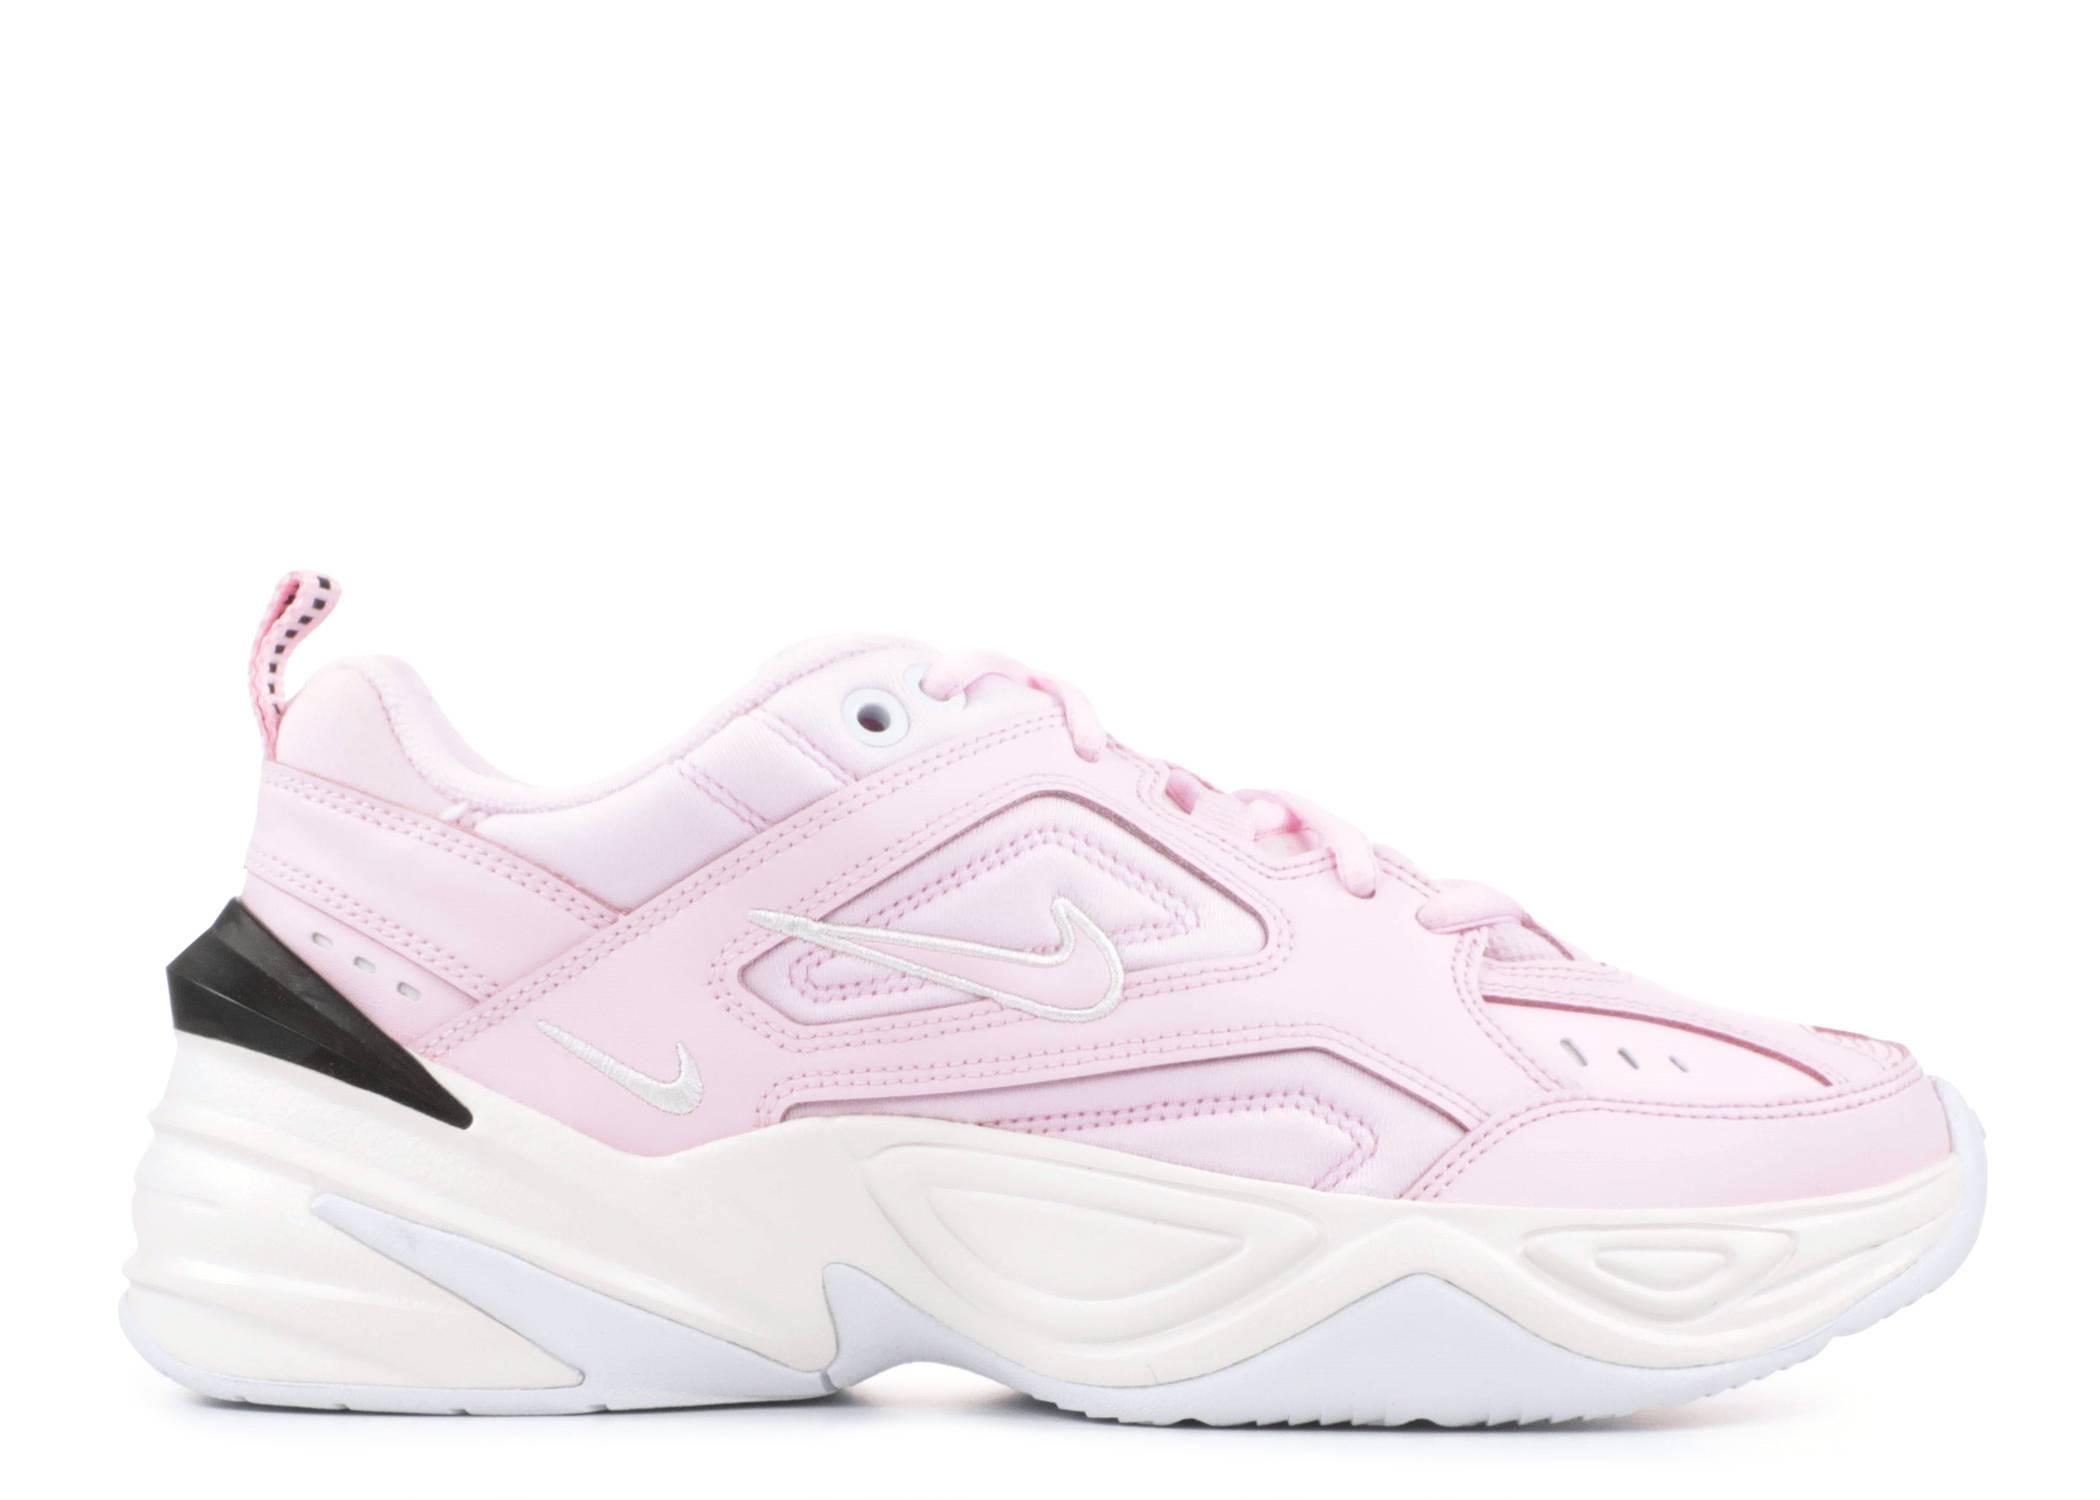 sofá a la deriva almuerzo  Wmns M2K Tekno 'Pink Foam' - Nike - AO3108 600 - pink foam/black-phantom  white | Flight Club